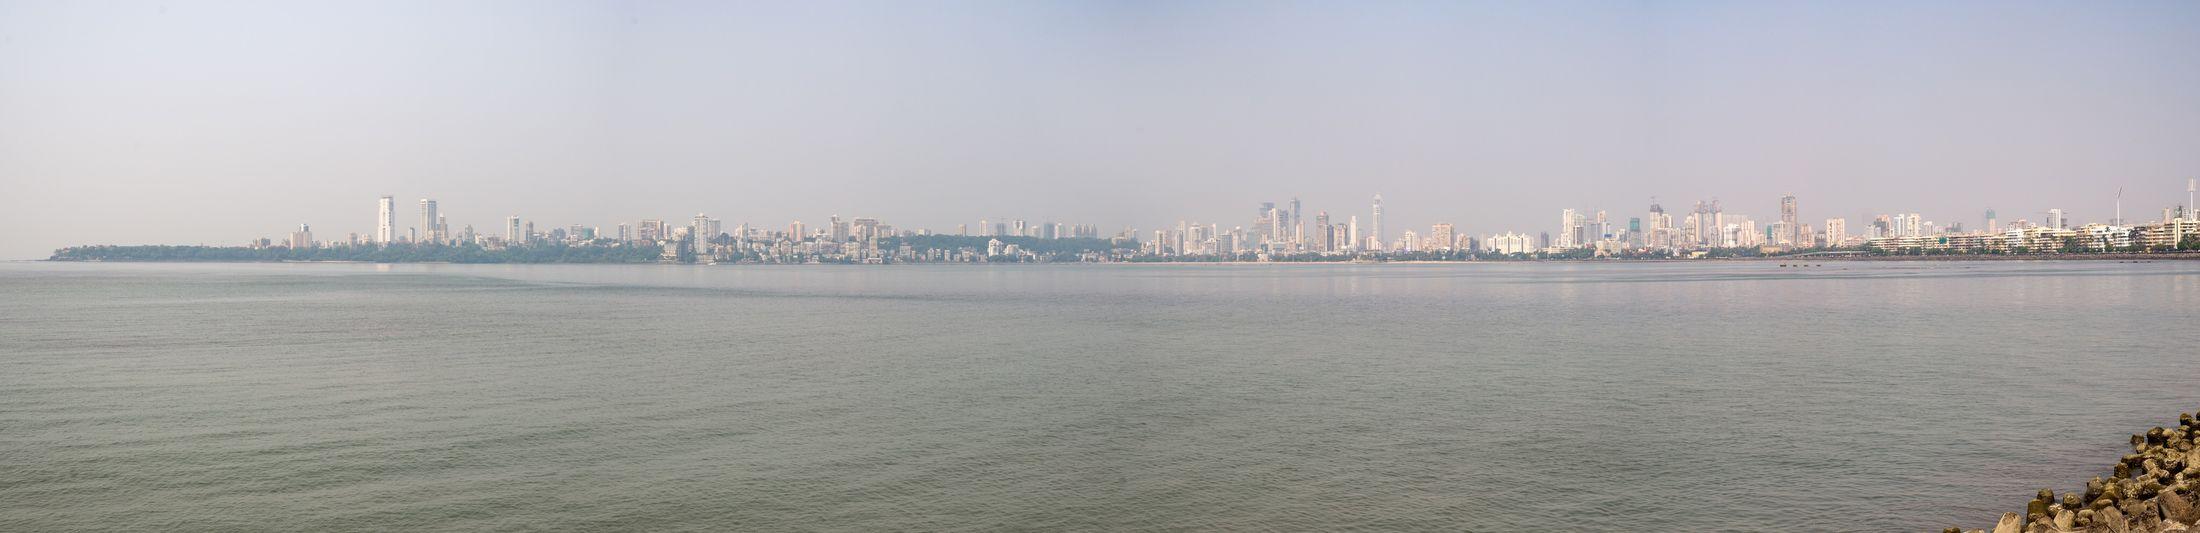 Mumbai Architecture City Cityscape Urban Skyline Travel Destinations Waterfront Outdoors Water Day Travel Nikon Nikon Df Panorama Panoramic Photography Panoramic Skyline Nikonphotography